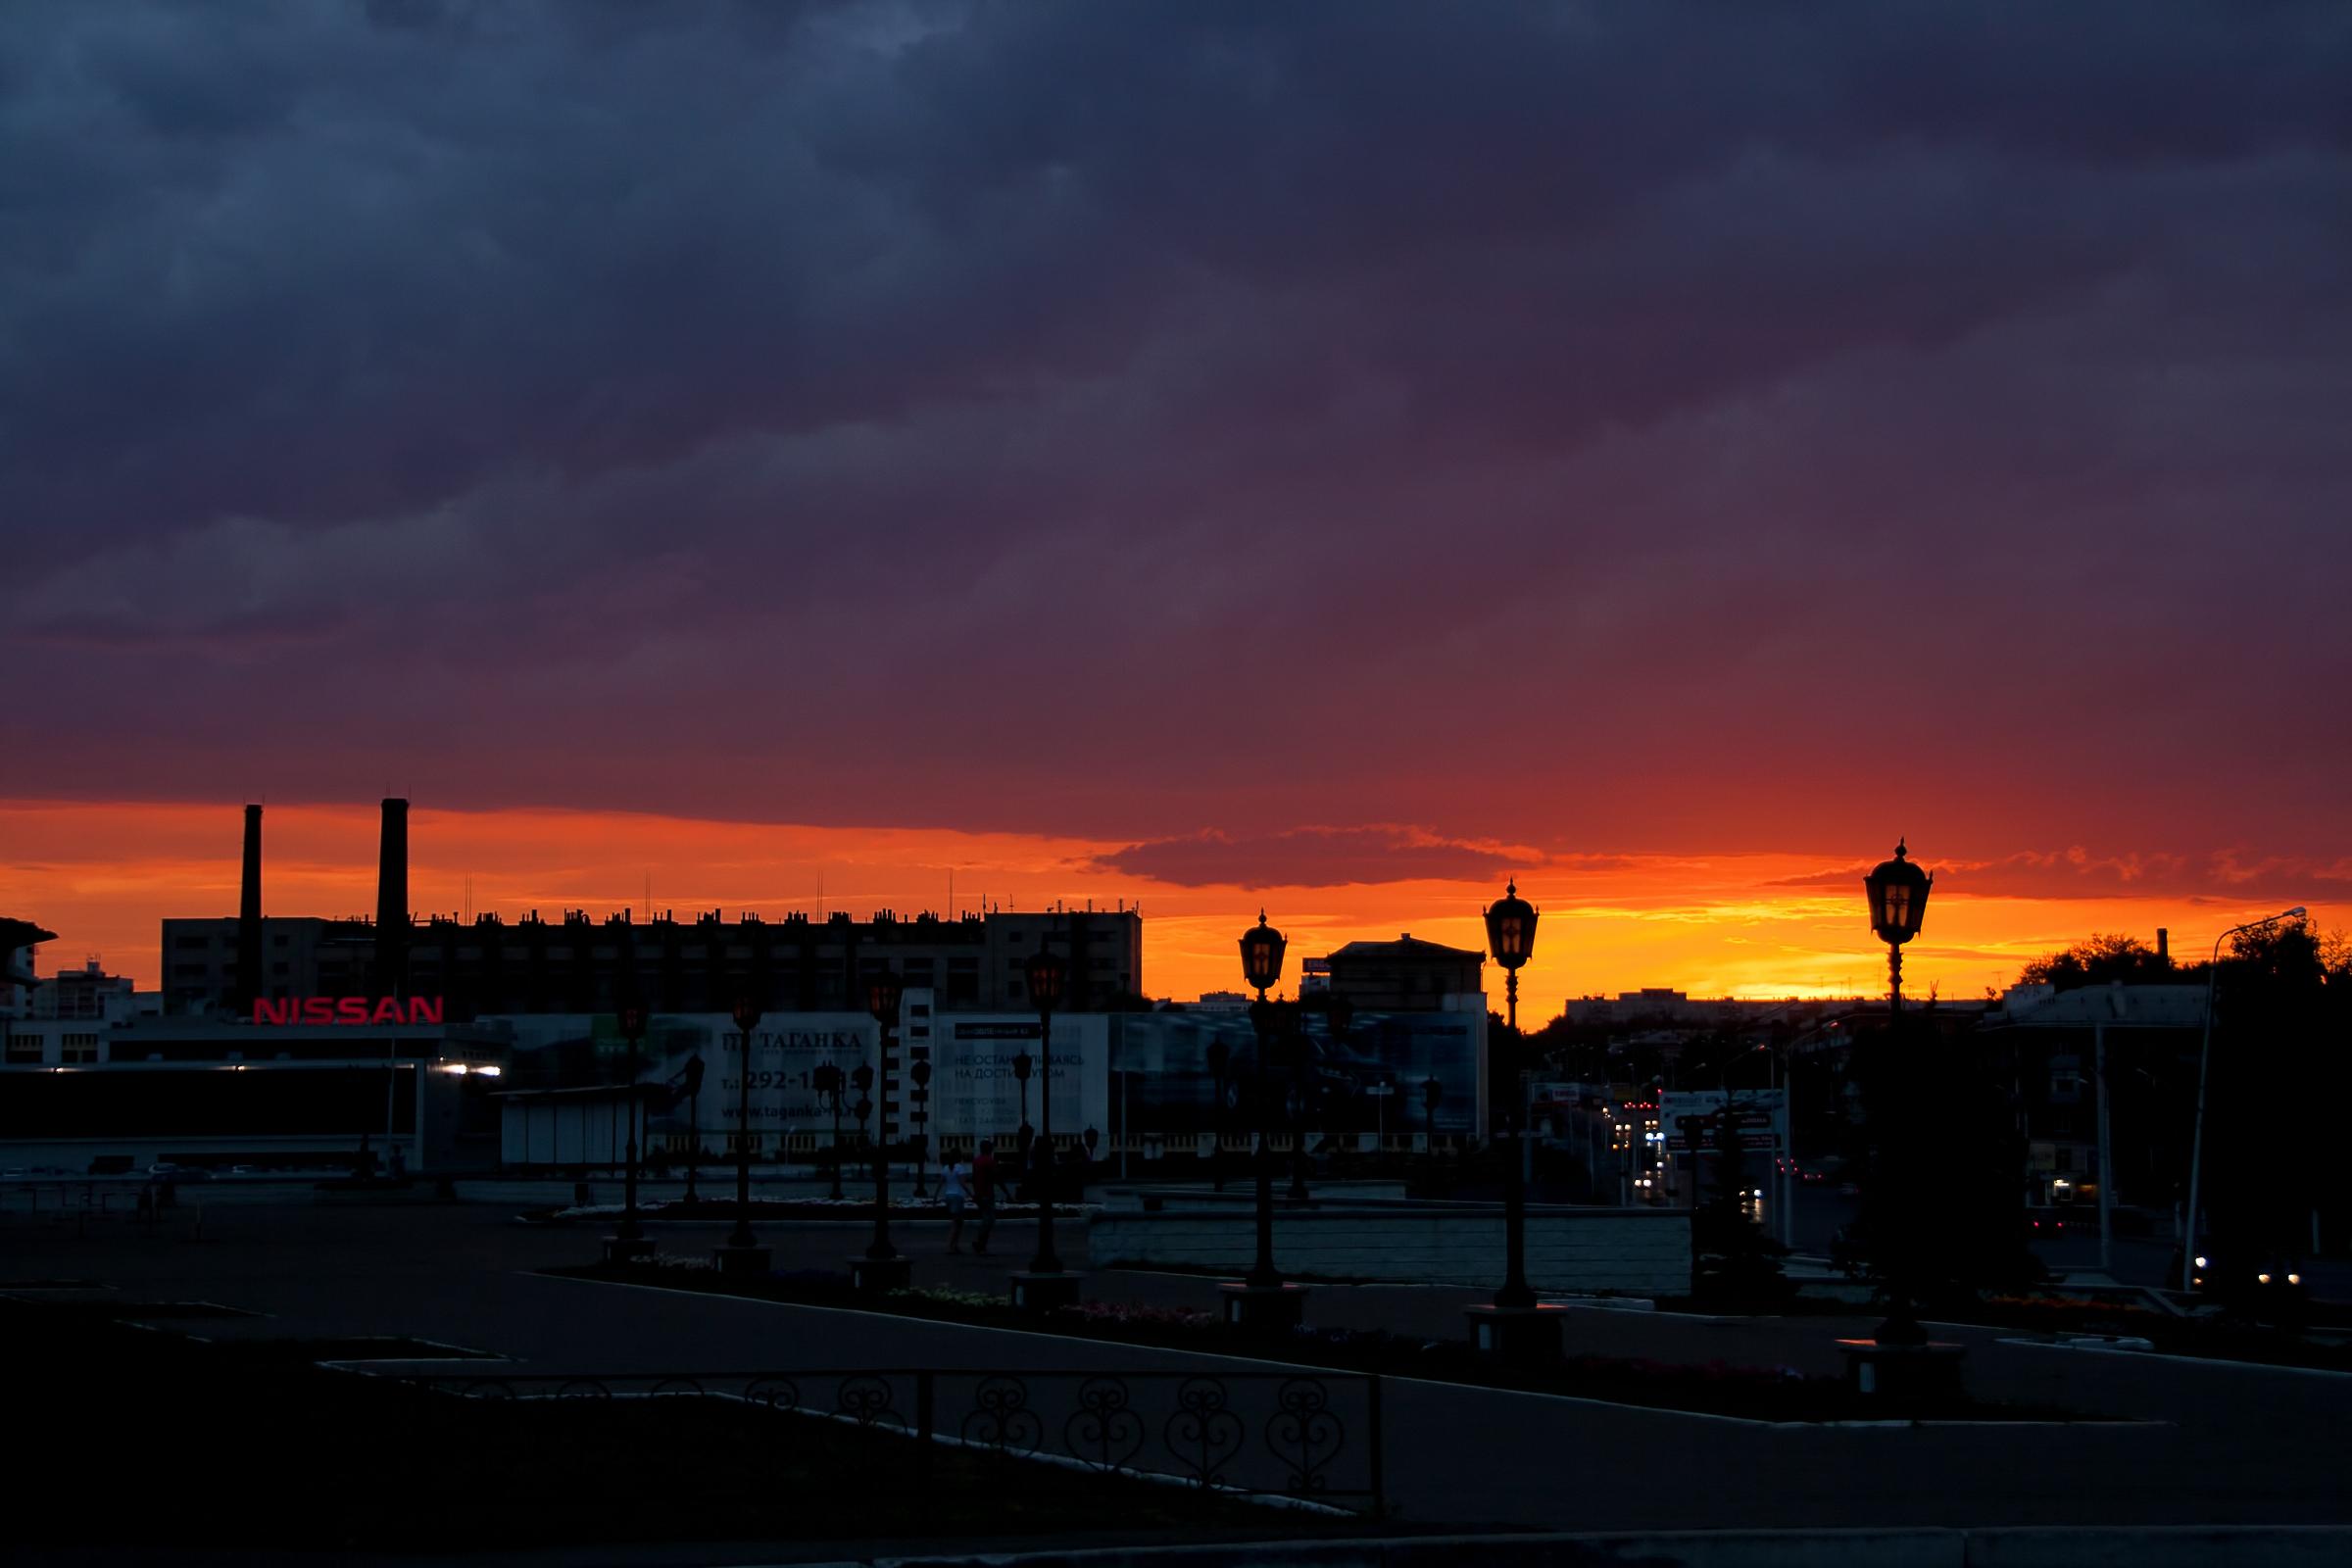 Evening Ufa